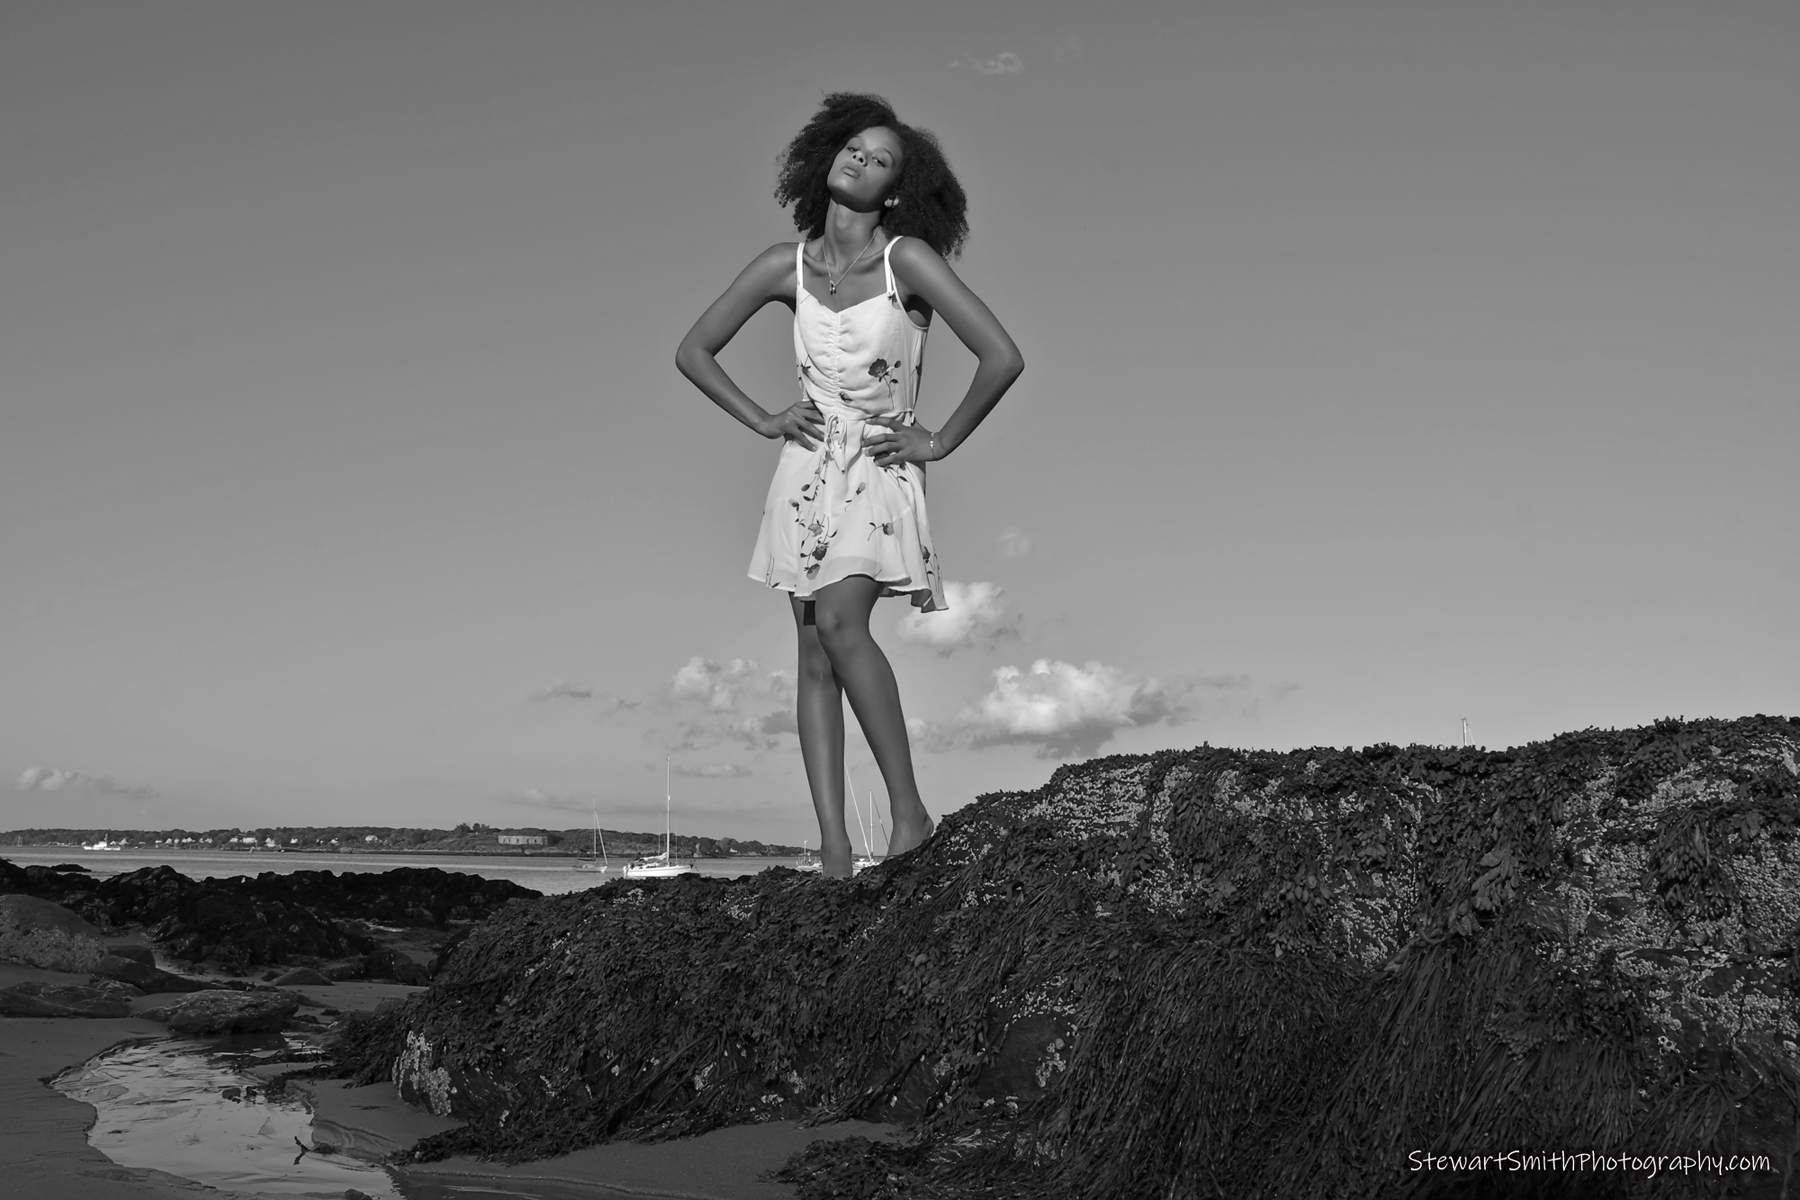 stewart smith photography